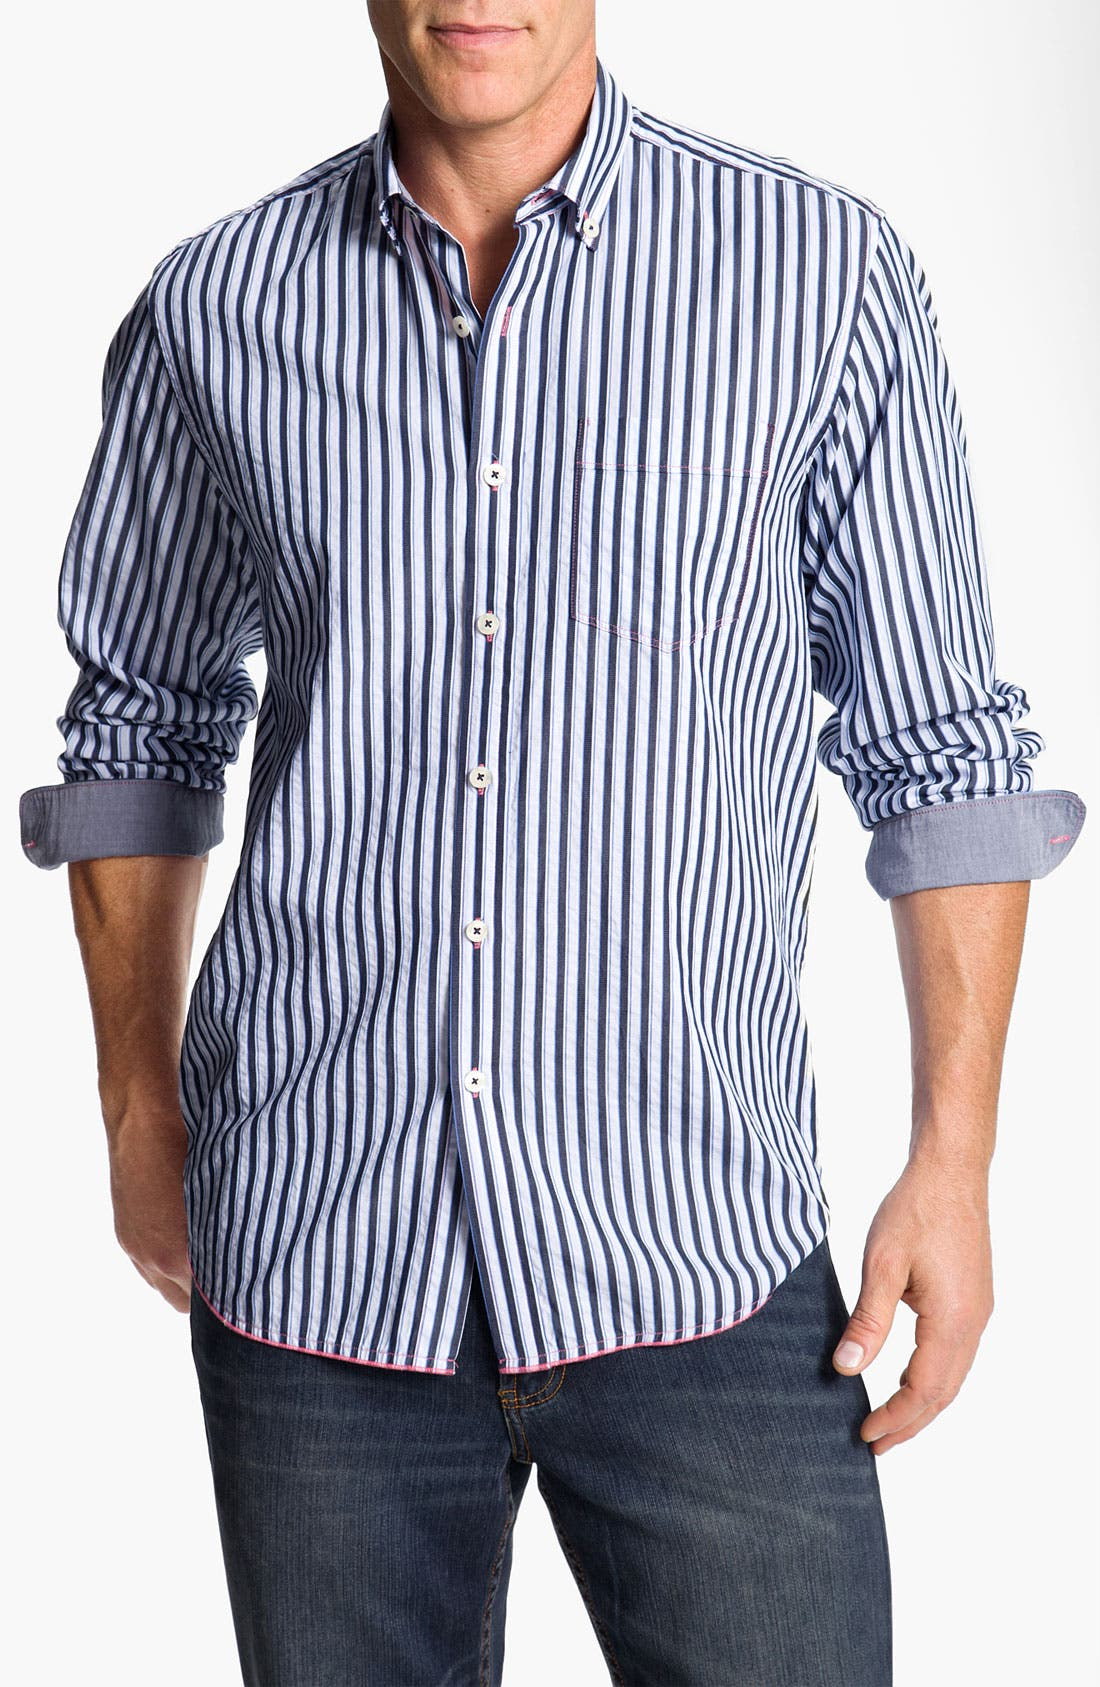 Alternate Image 1 Selected - Tommy Bahama Denim 'Dalat Stripe' Sport Shirt